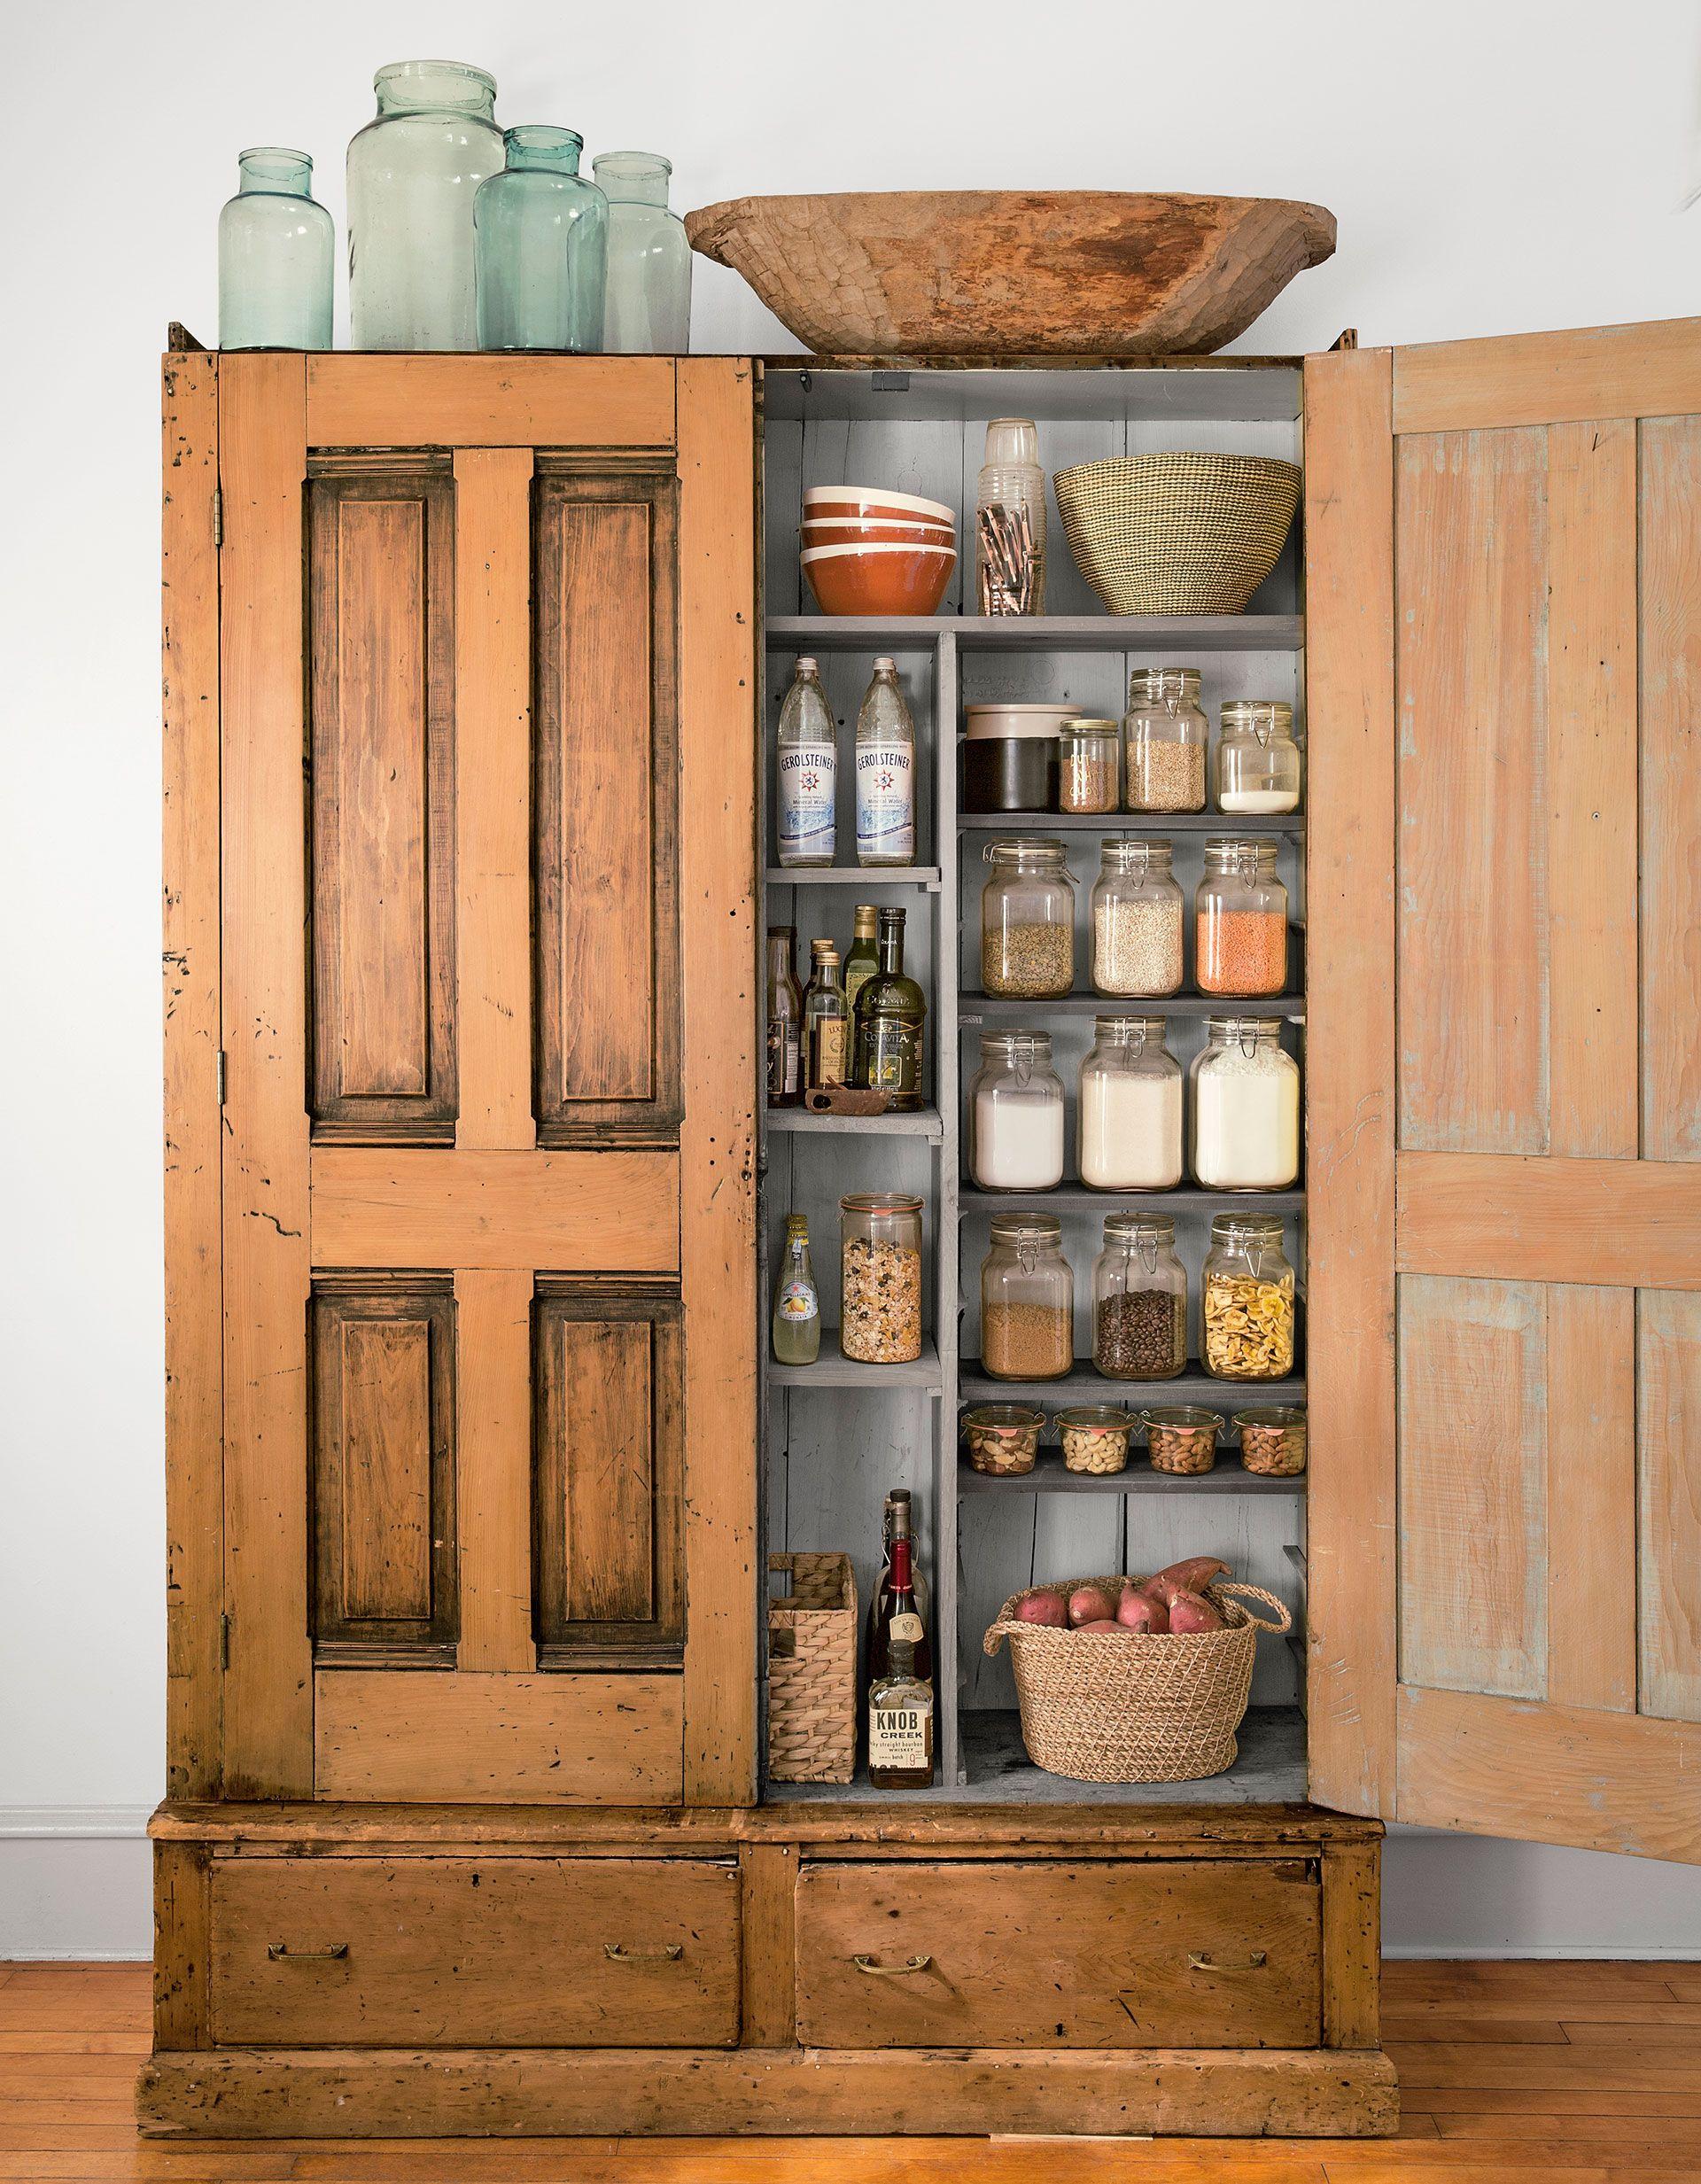 39 ways to sneak storage into your home  kitchen armoirearmoire     39 ways to sneak storage into your home   kitchen pantries      rh   pinterest com